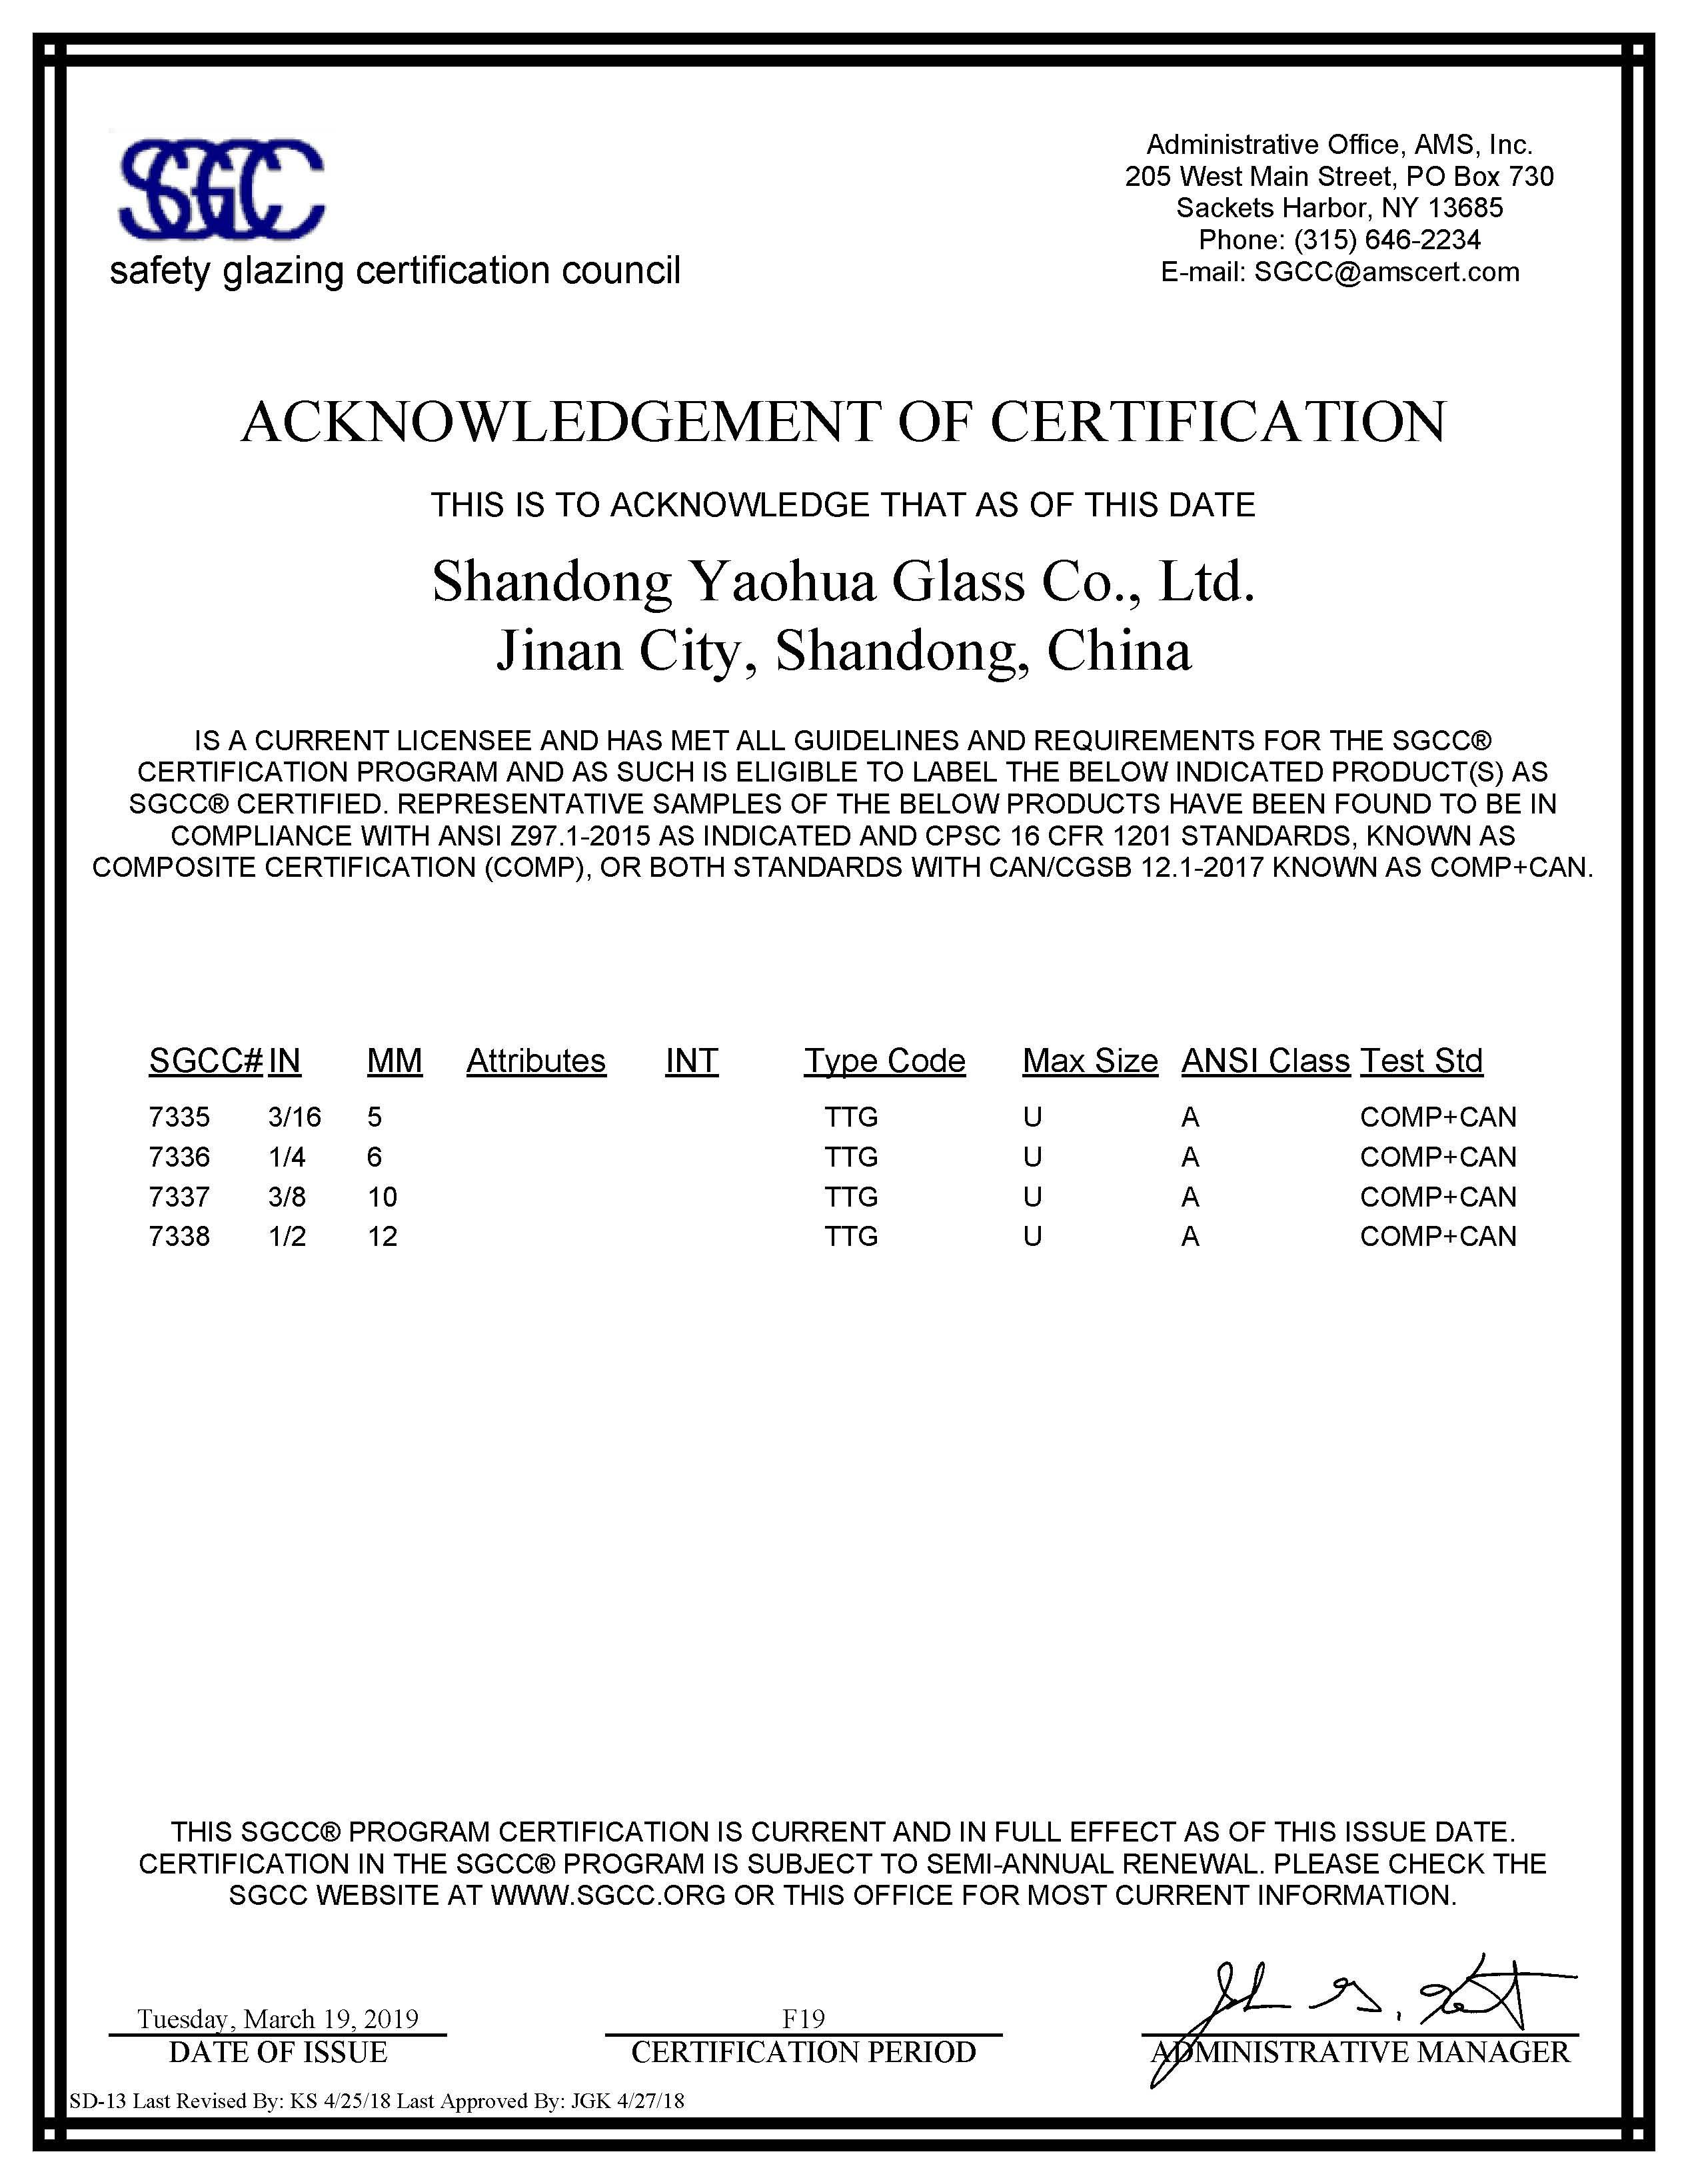 13.52 tempered laminated glass 17.52mm 21.52mm laminated glass Shandong Yaohua Glass